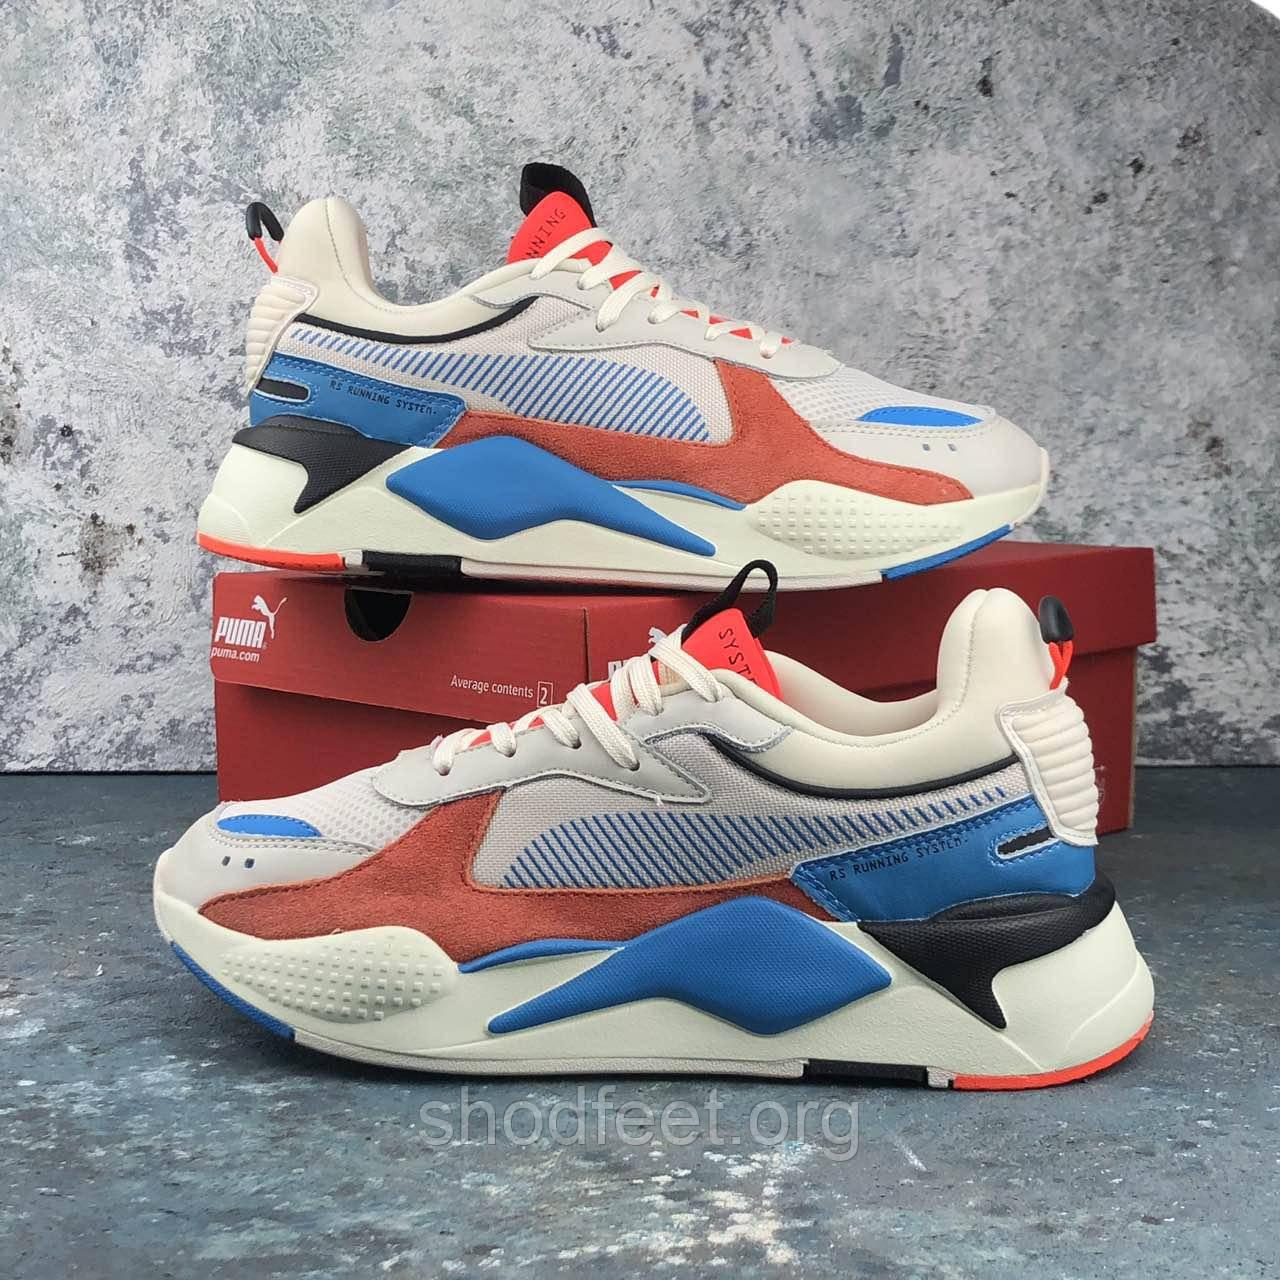 Мужские кроссовки Puma Rs-x Reinvention Cream Red Blue